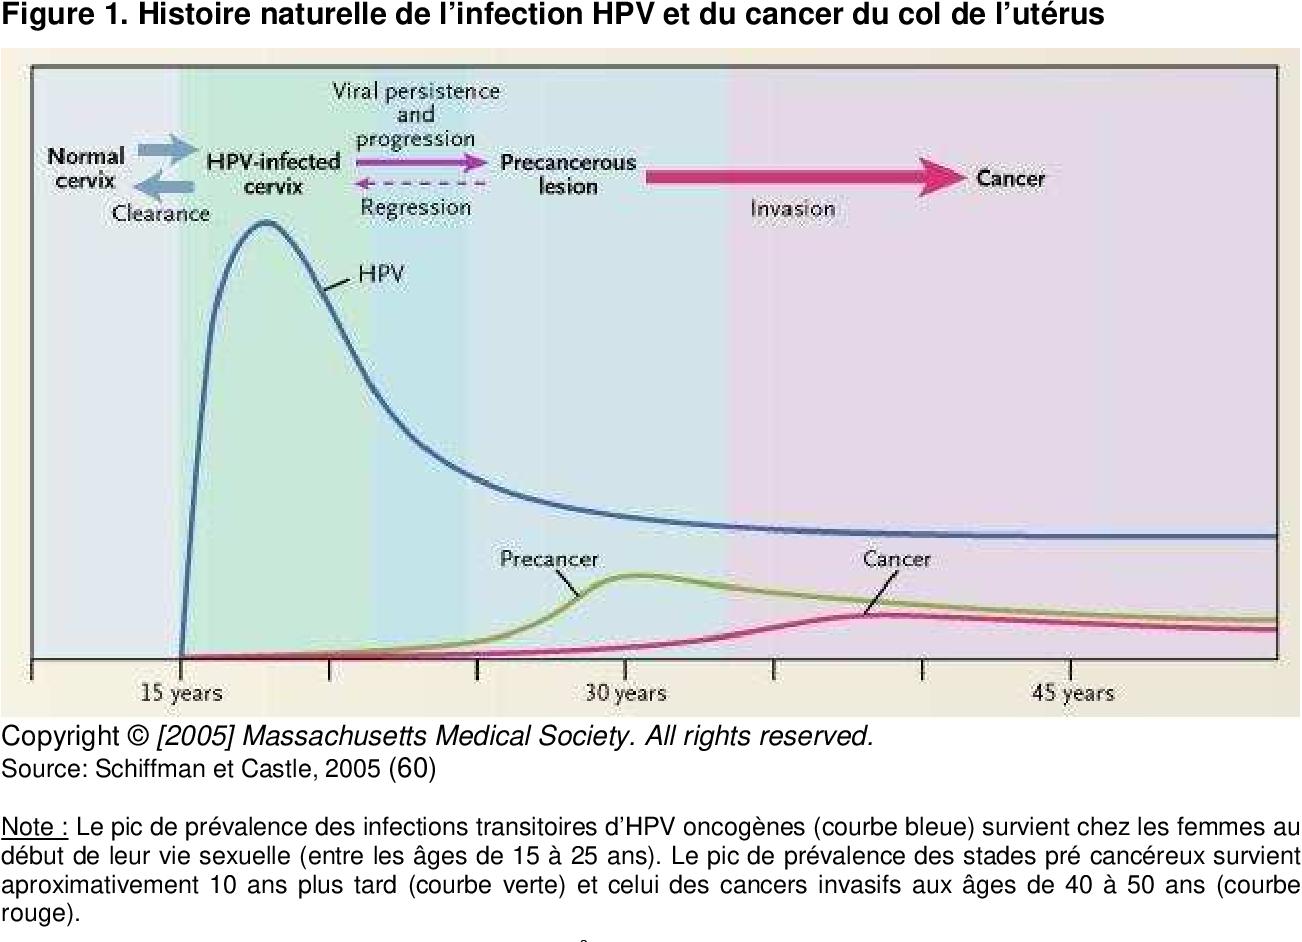 hpv cancer du col de luterus